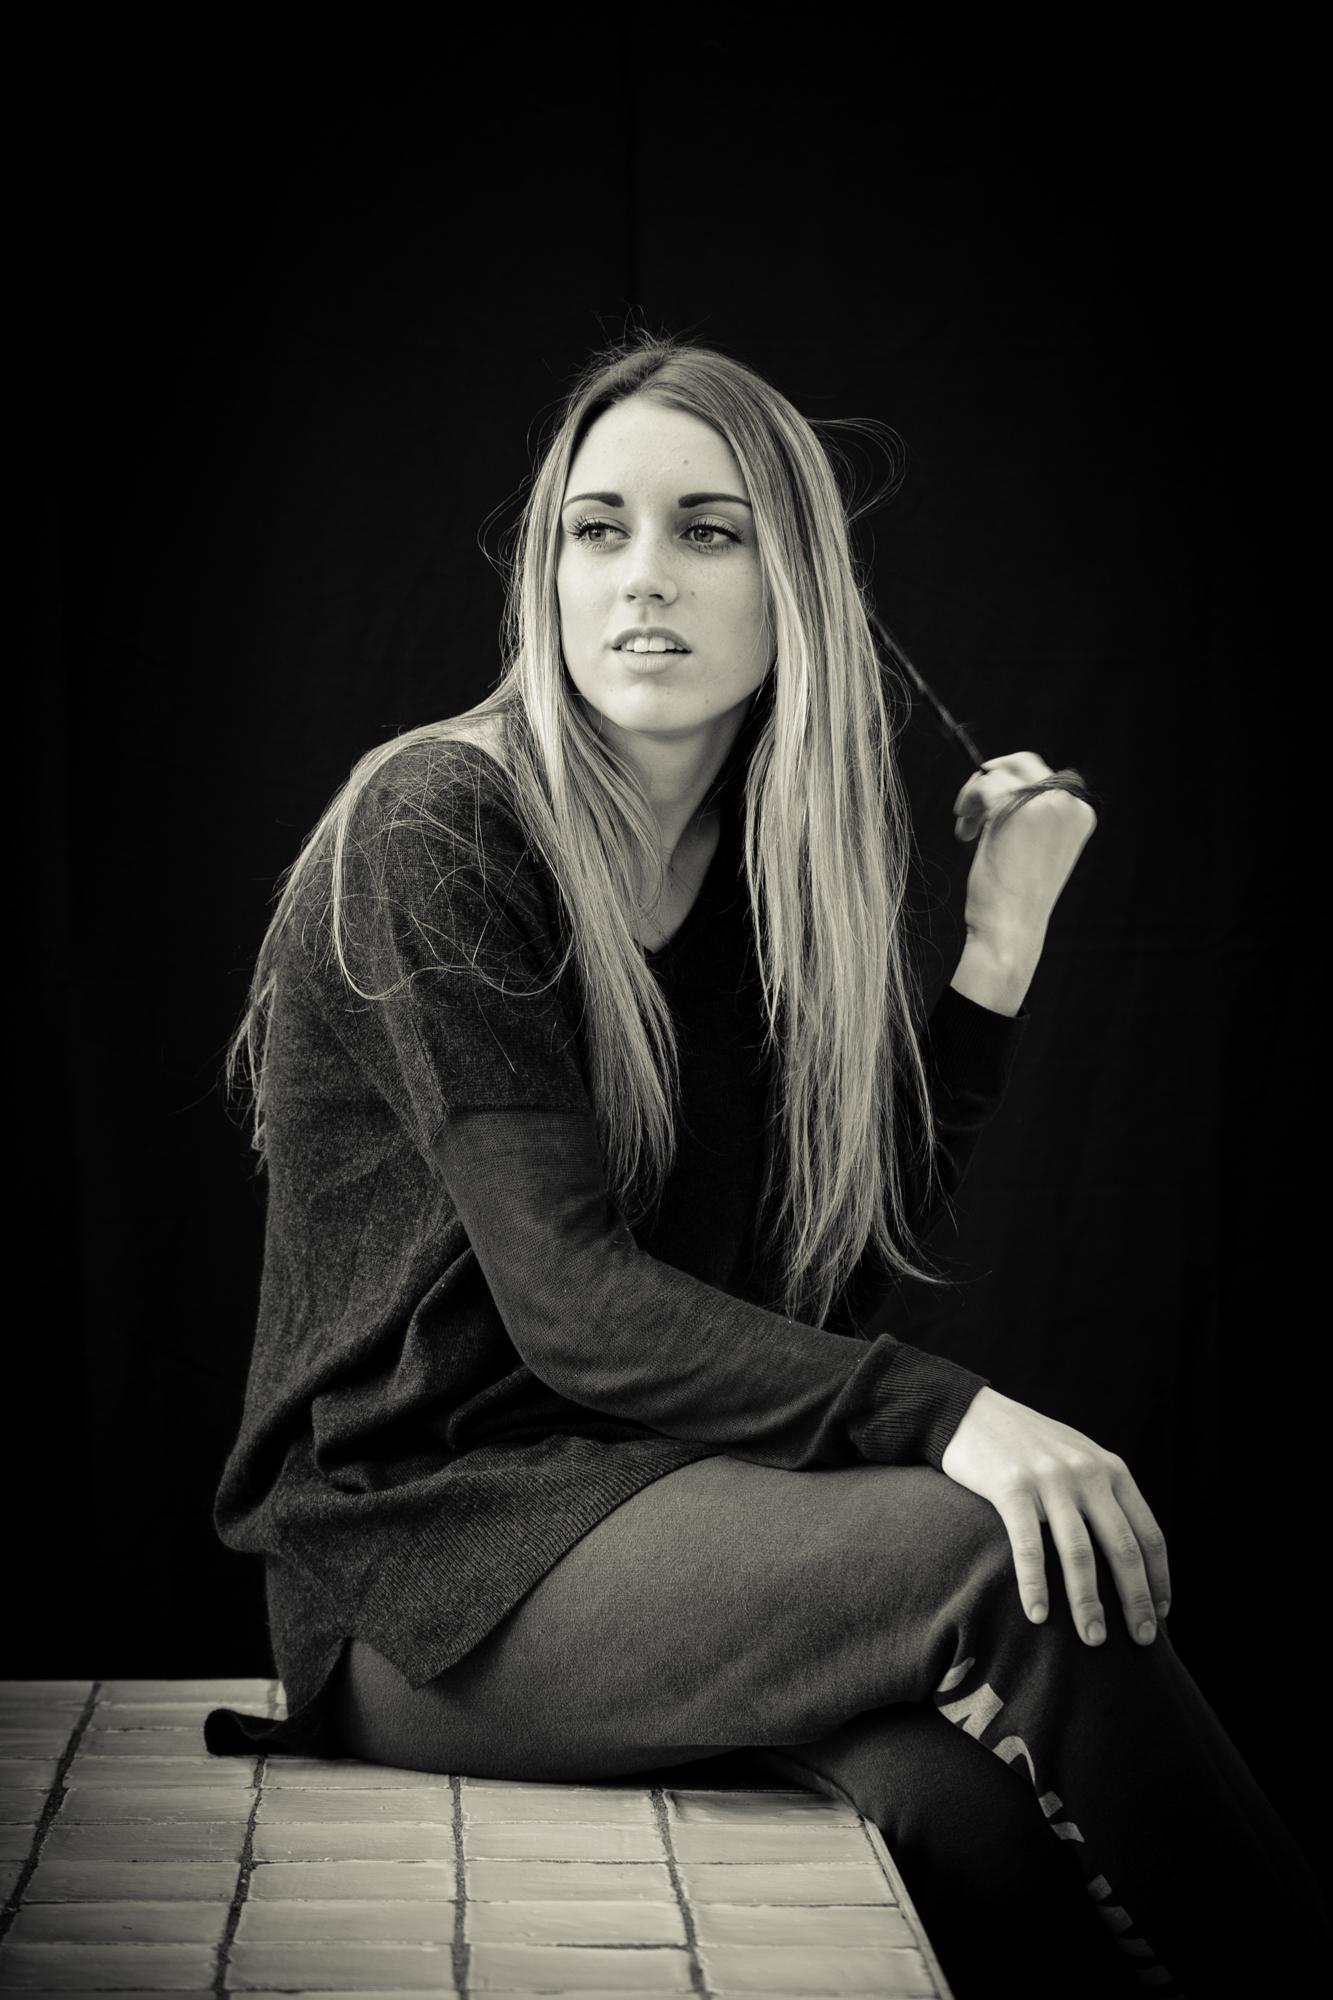 London teen photography